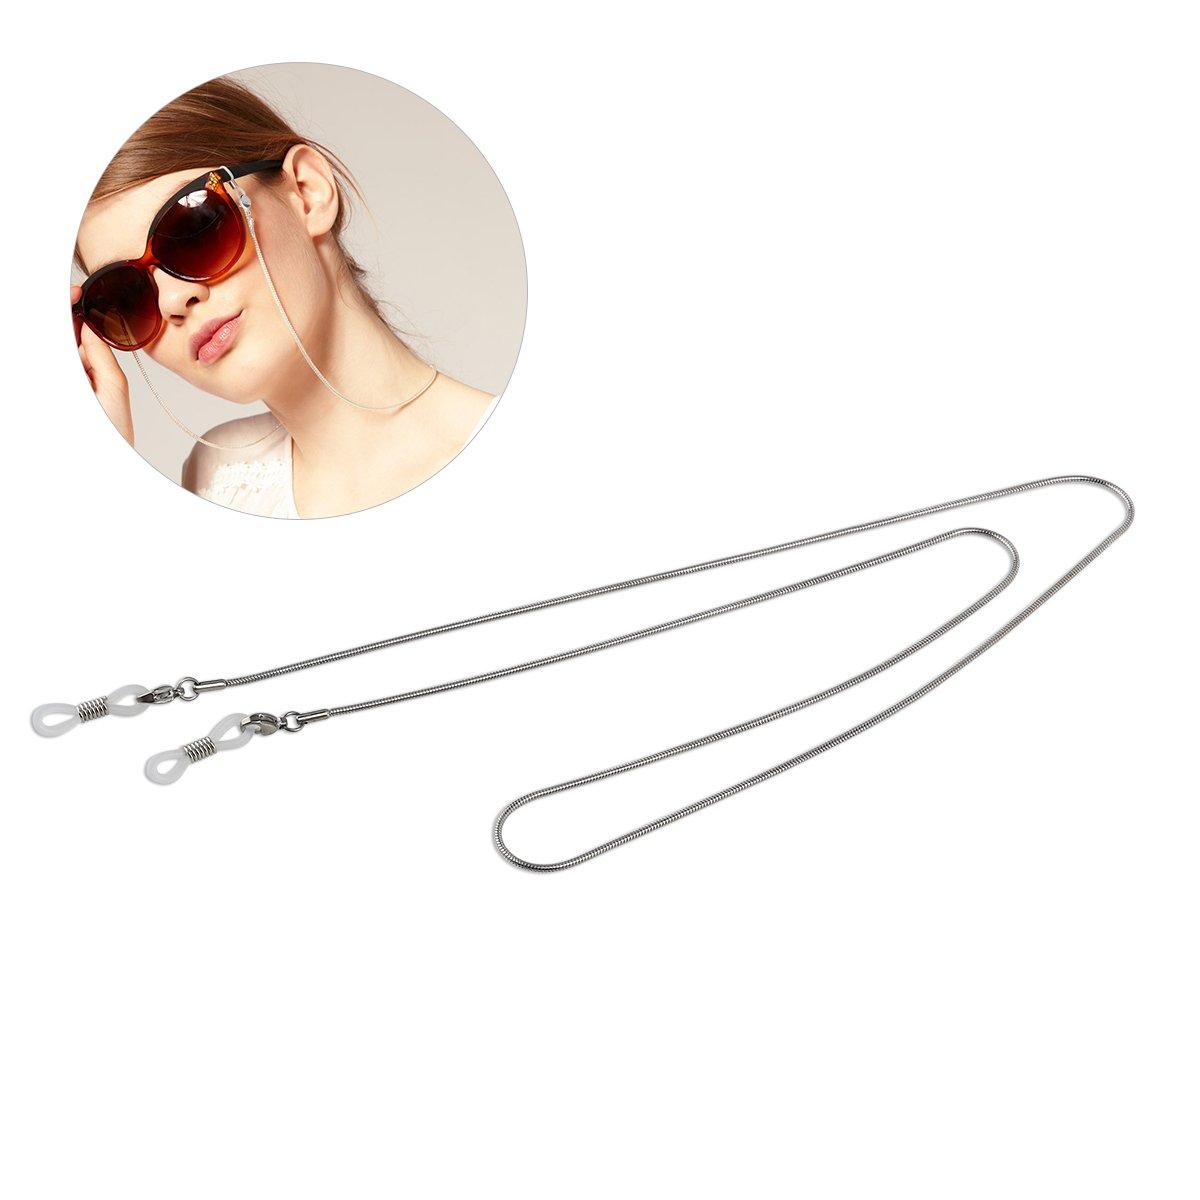 LUOEM Copper Eyeglass Sunglasses Chain Cord Neck Strap Holder Long Non-slip (Silver) ULBZ151626QE89N5094